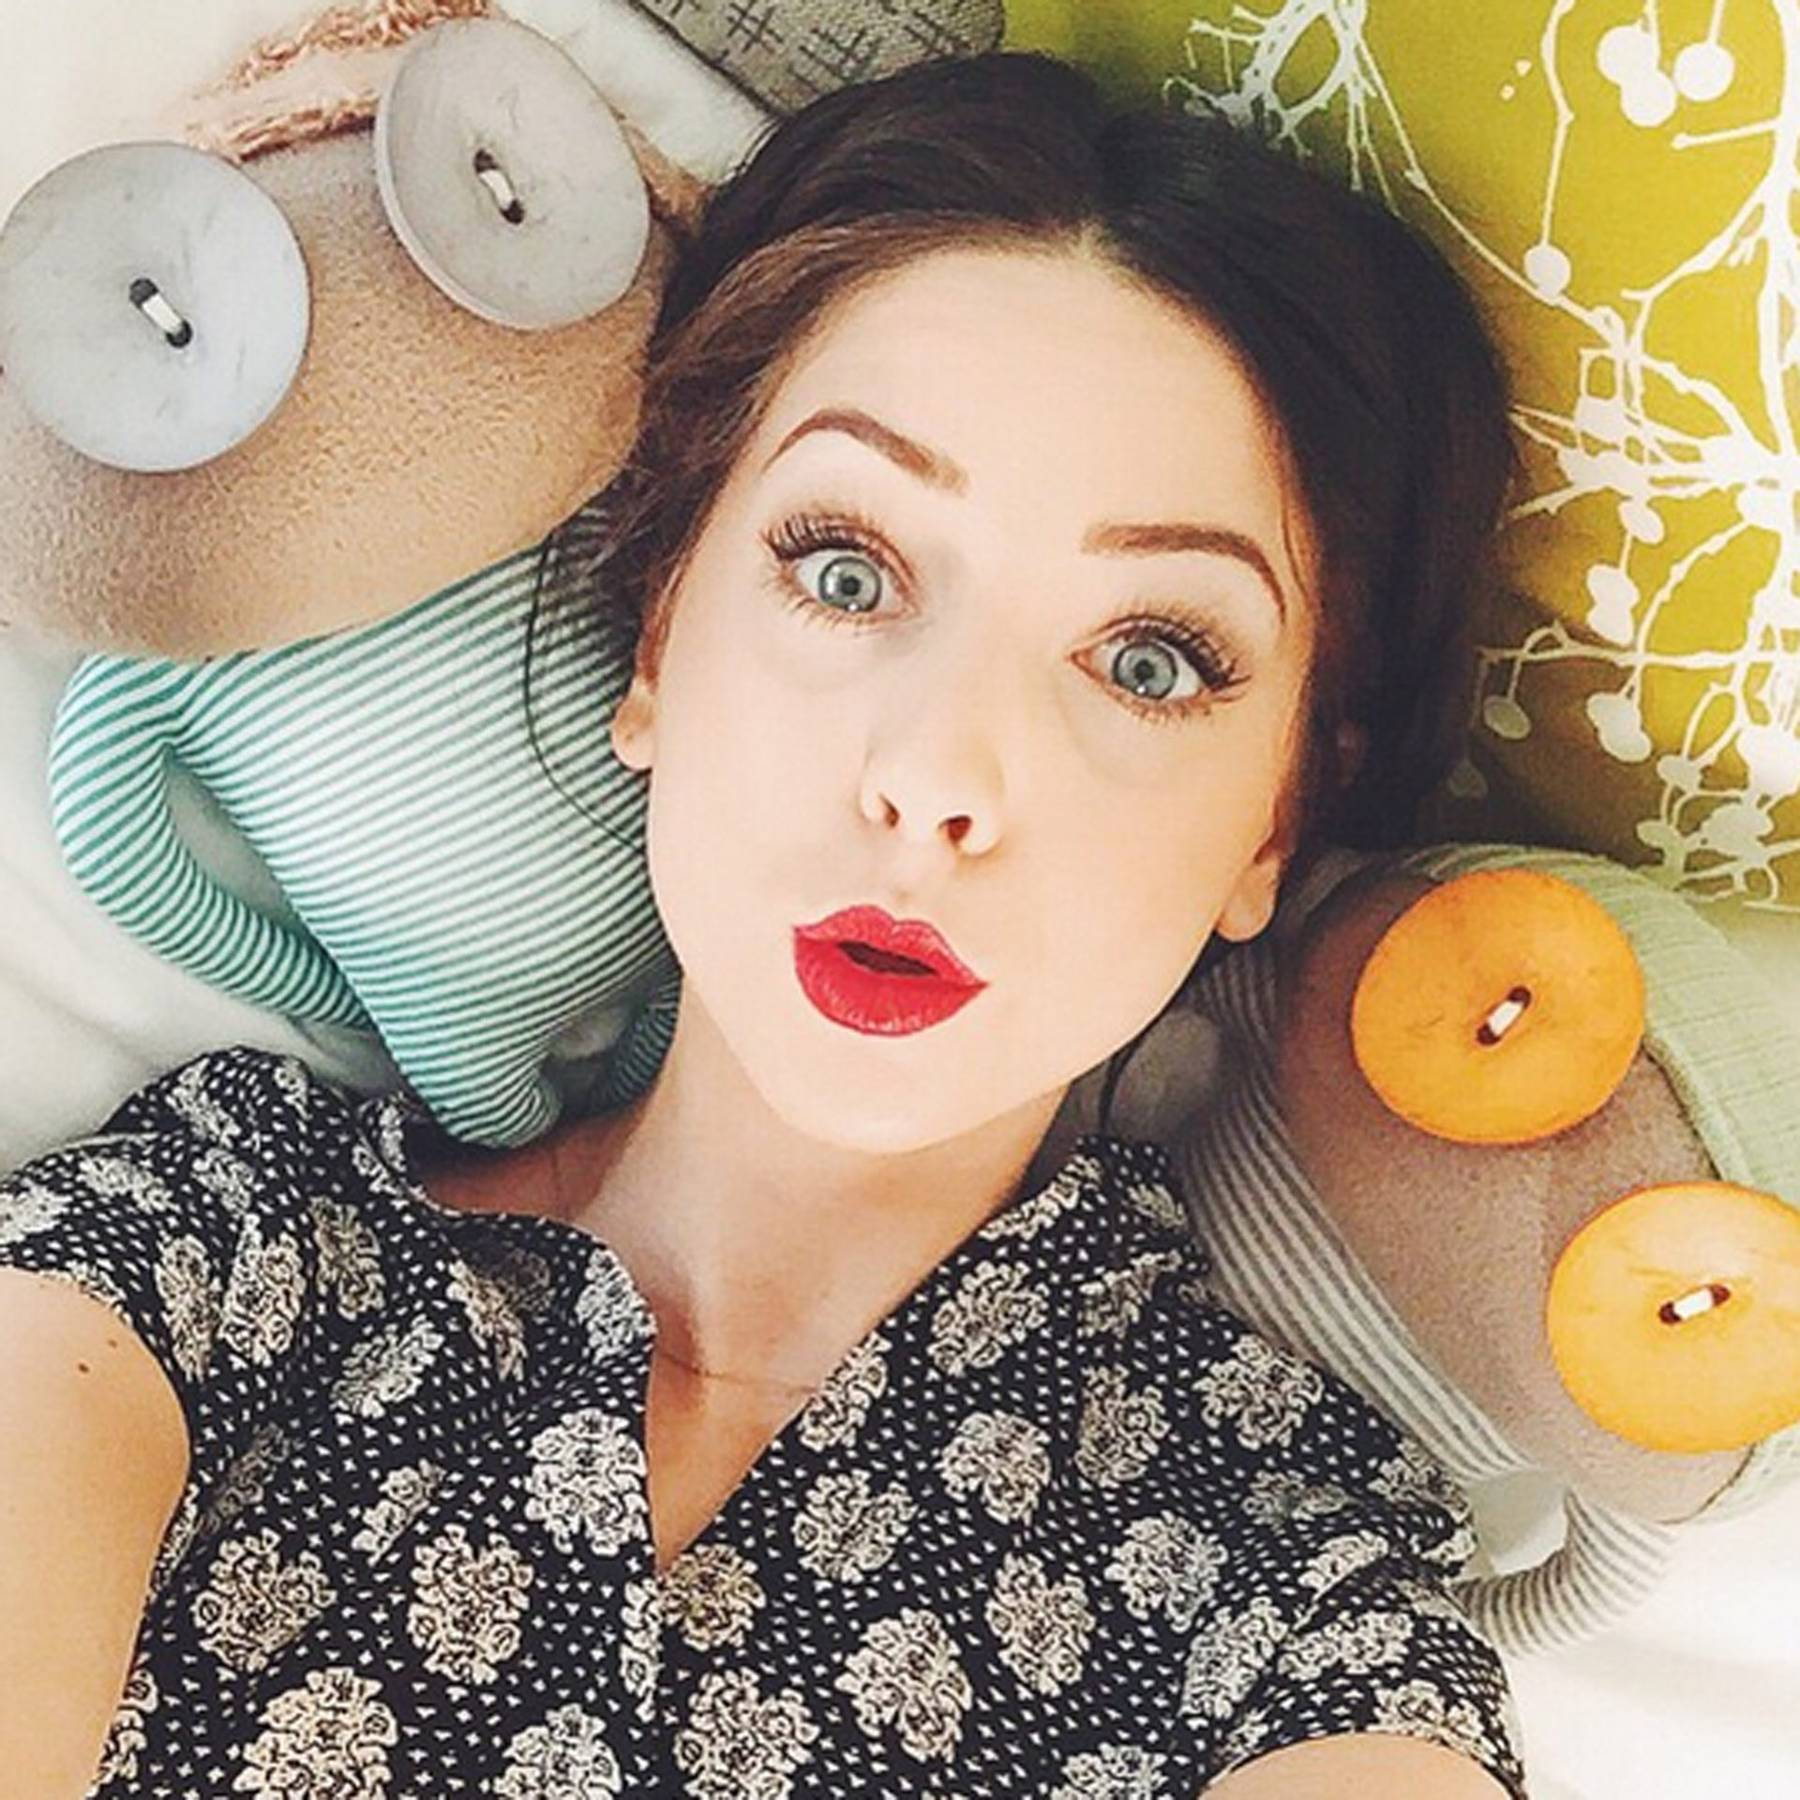 Zoe Sugg hot lips pics